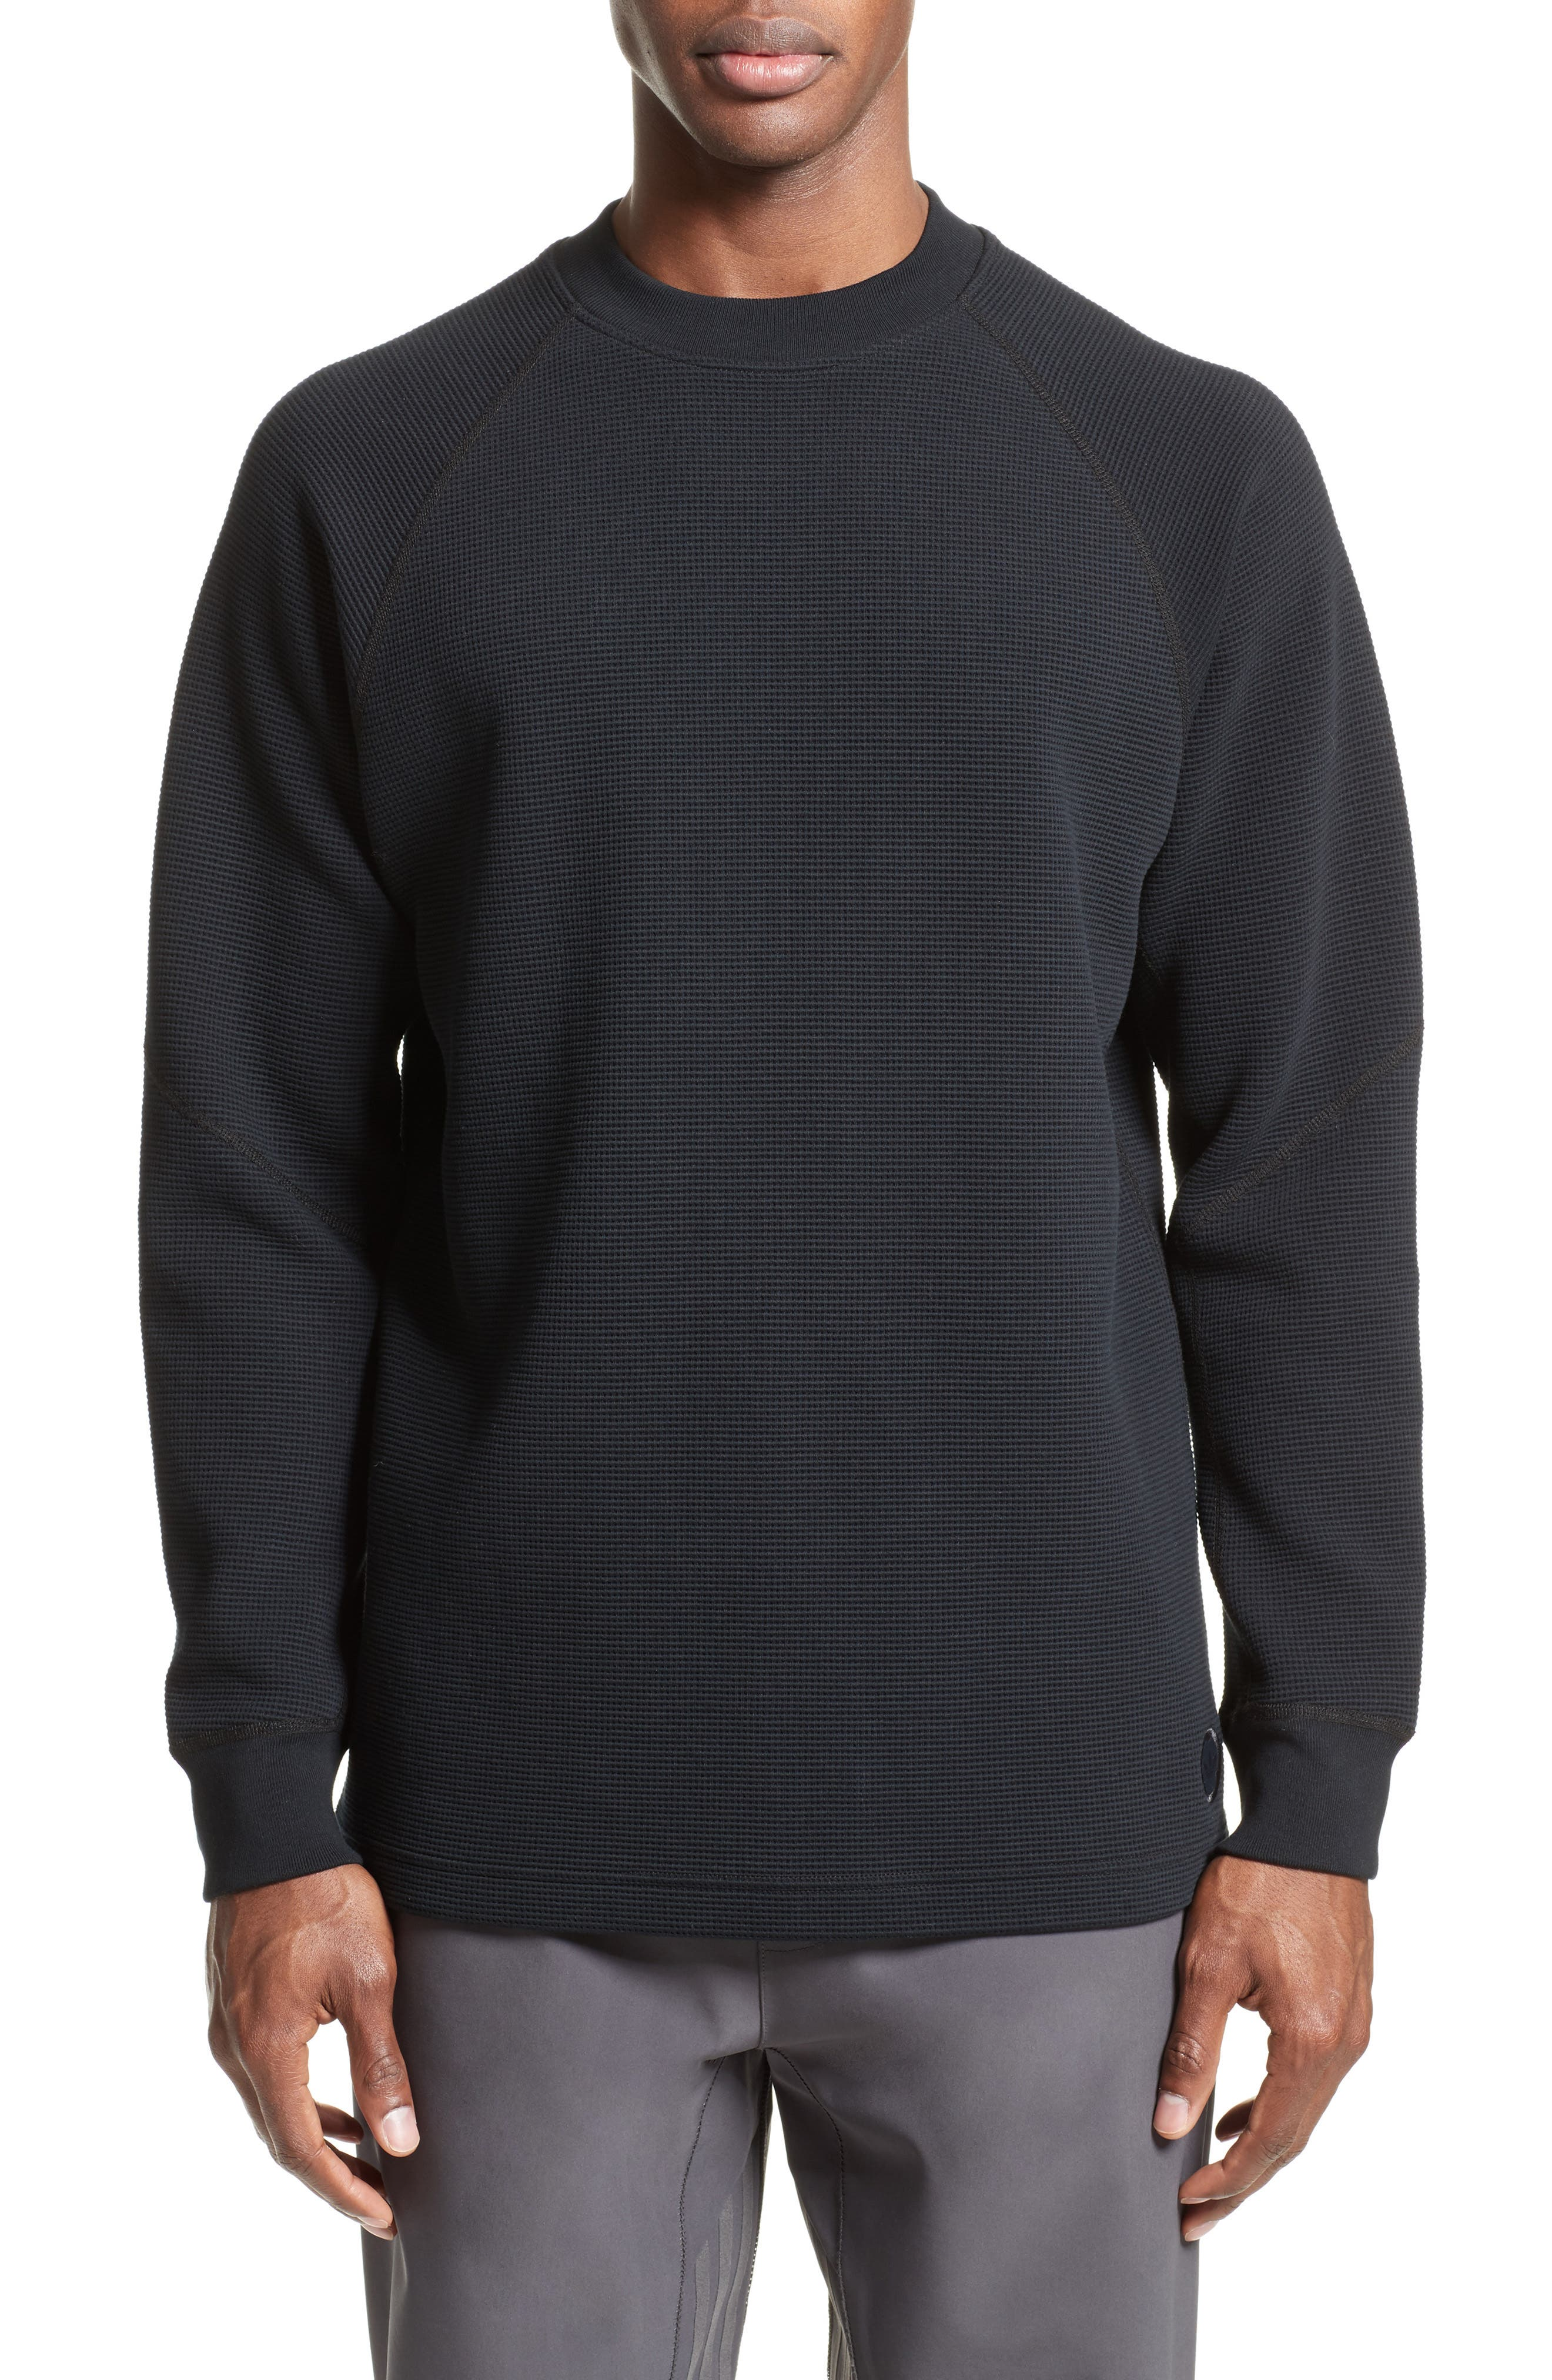 Fisherman Crewneck Sweatshirt,                             Main thumbnail 1, color,                             001